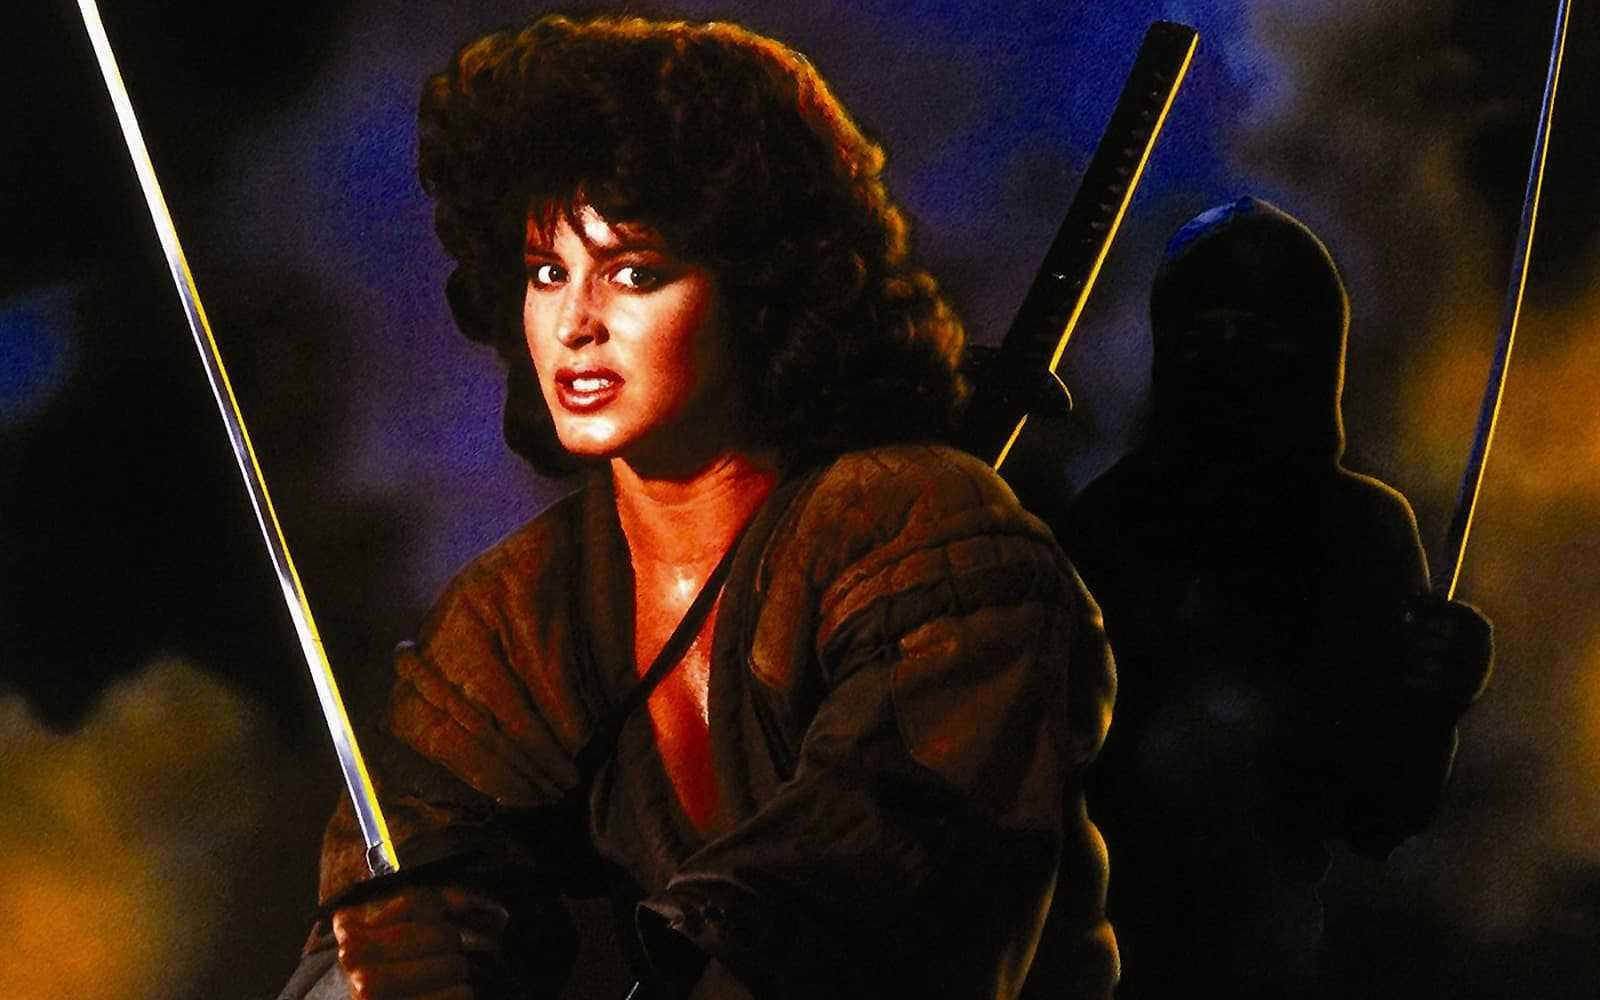 Ninja III: The Domination - Sam Firstenberg